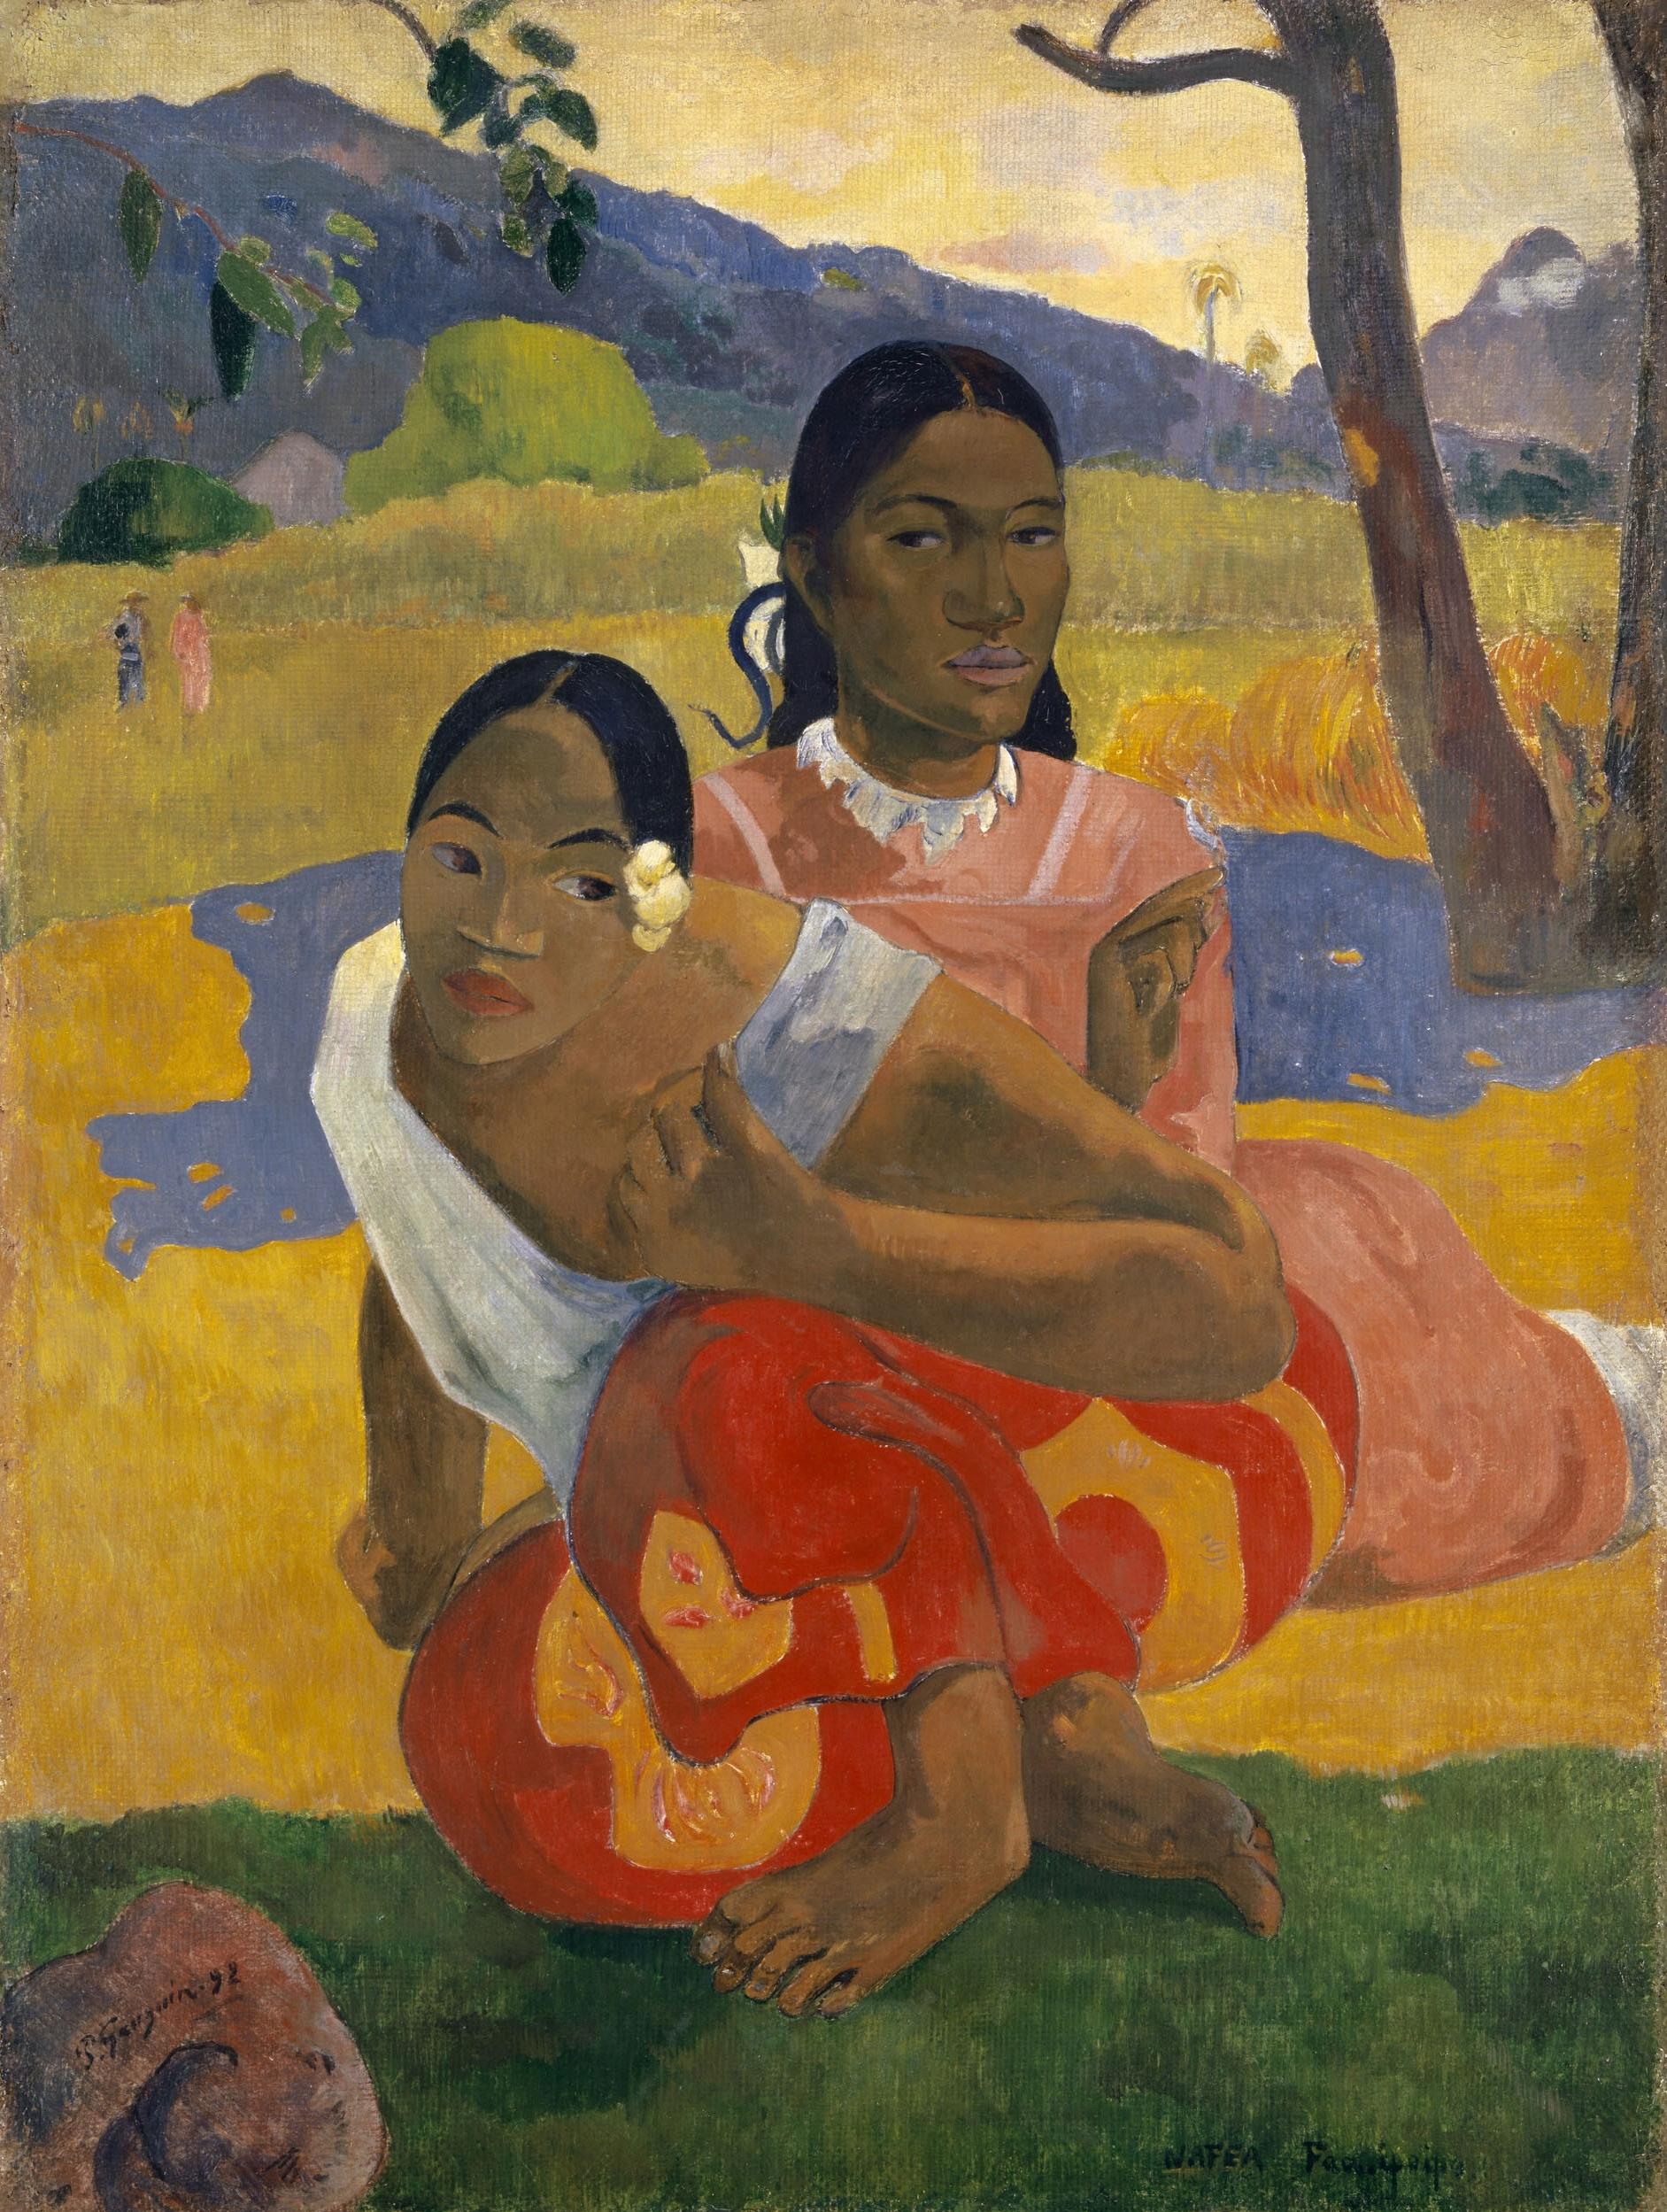 Paul Gauguin, Nafea faa ipoipo, 1892